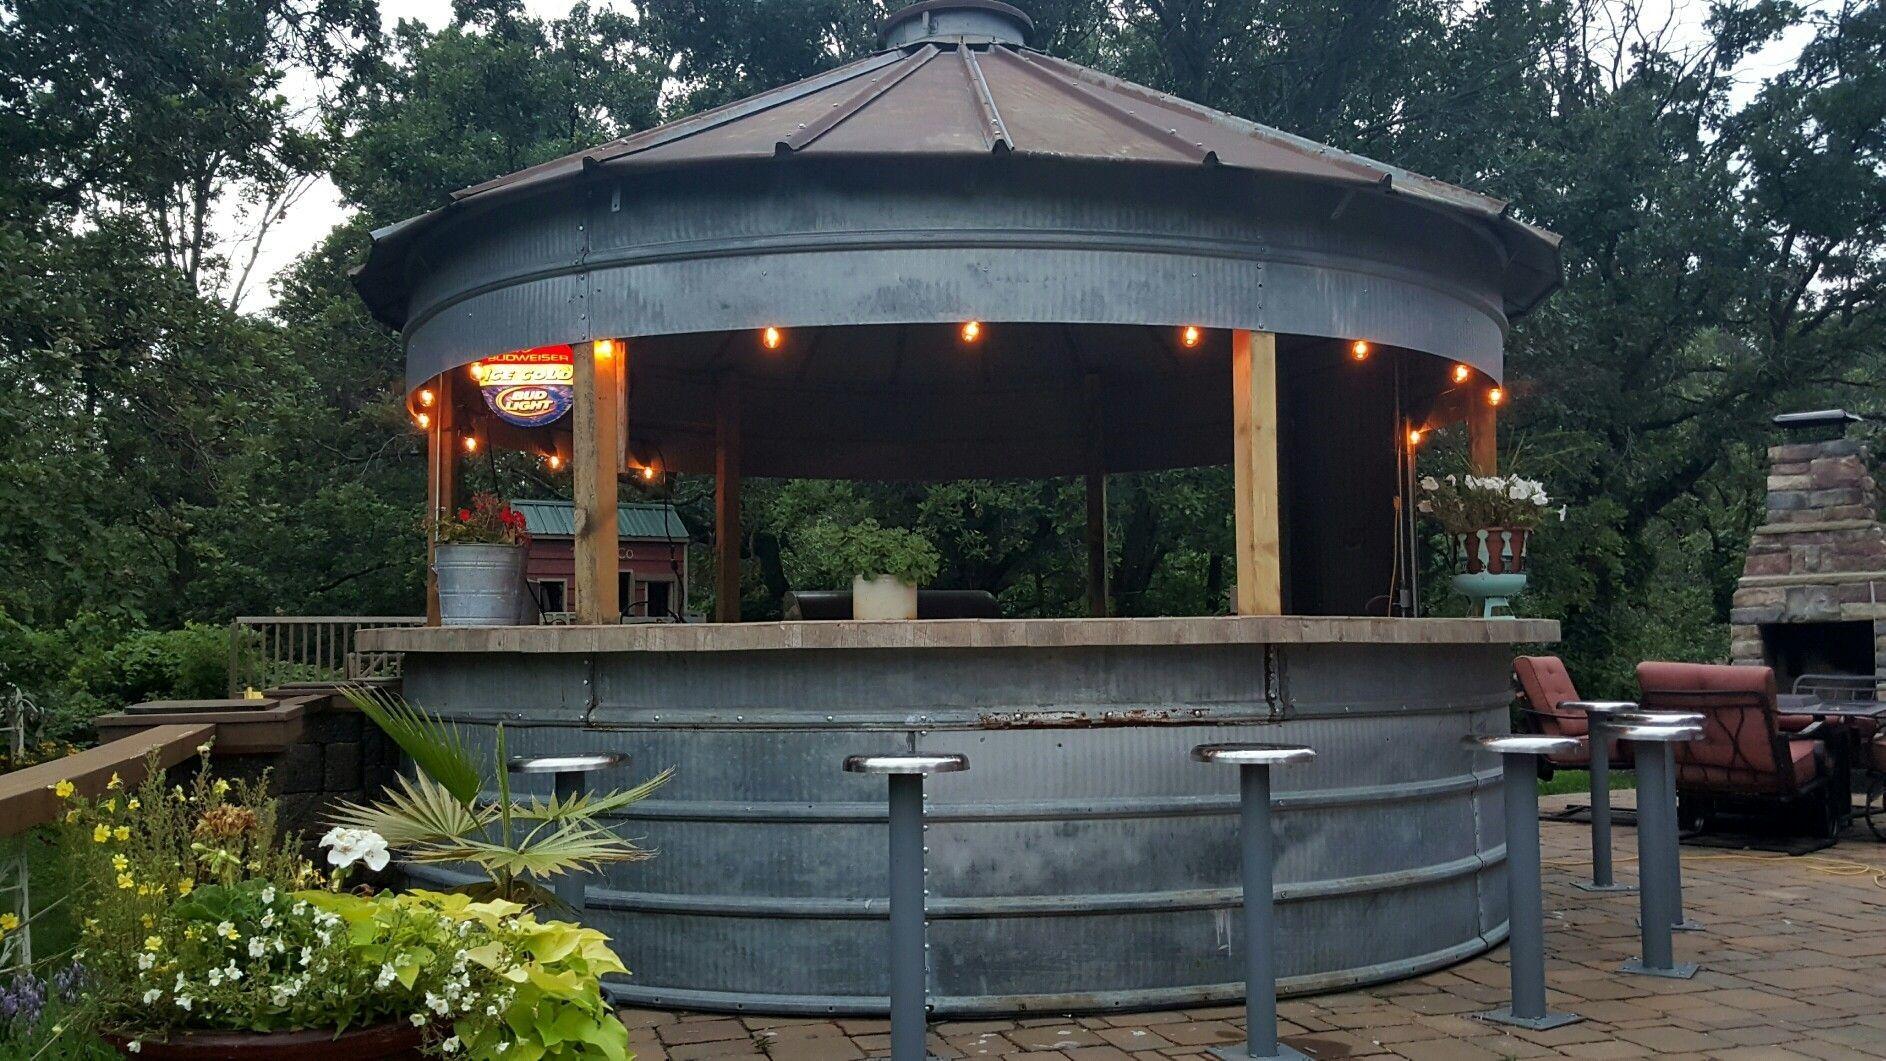 Shed Diy  Grain Bin~Baroutdoor Kitchen Now You Can Build